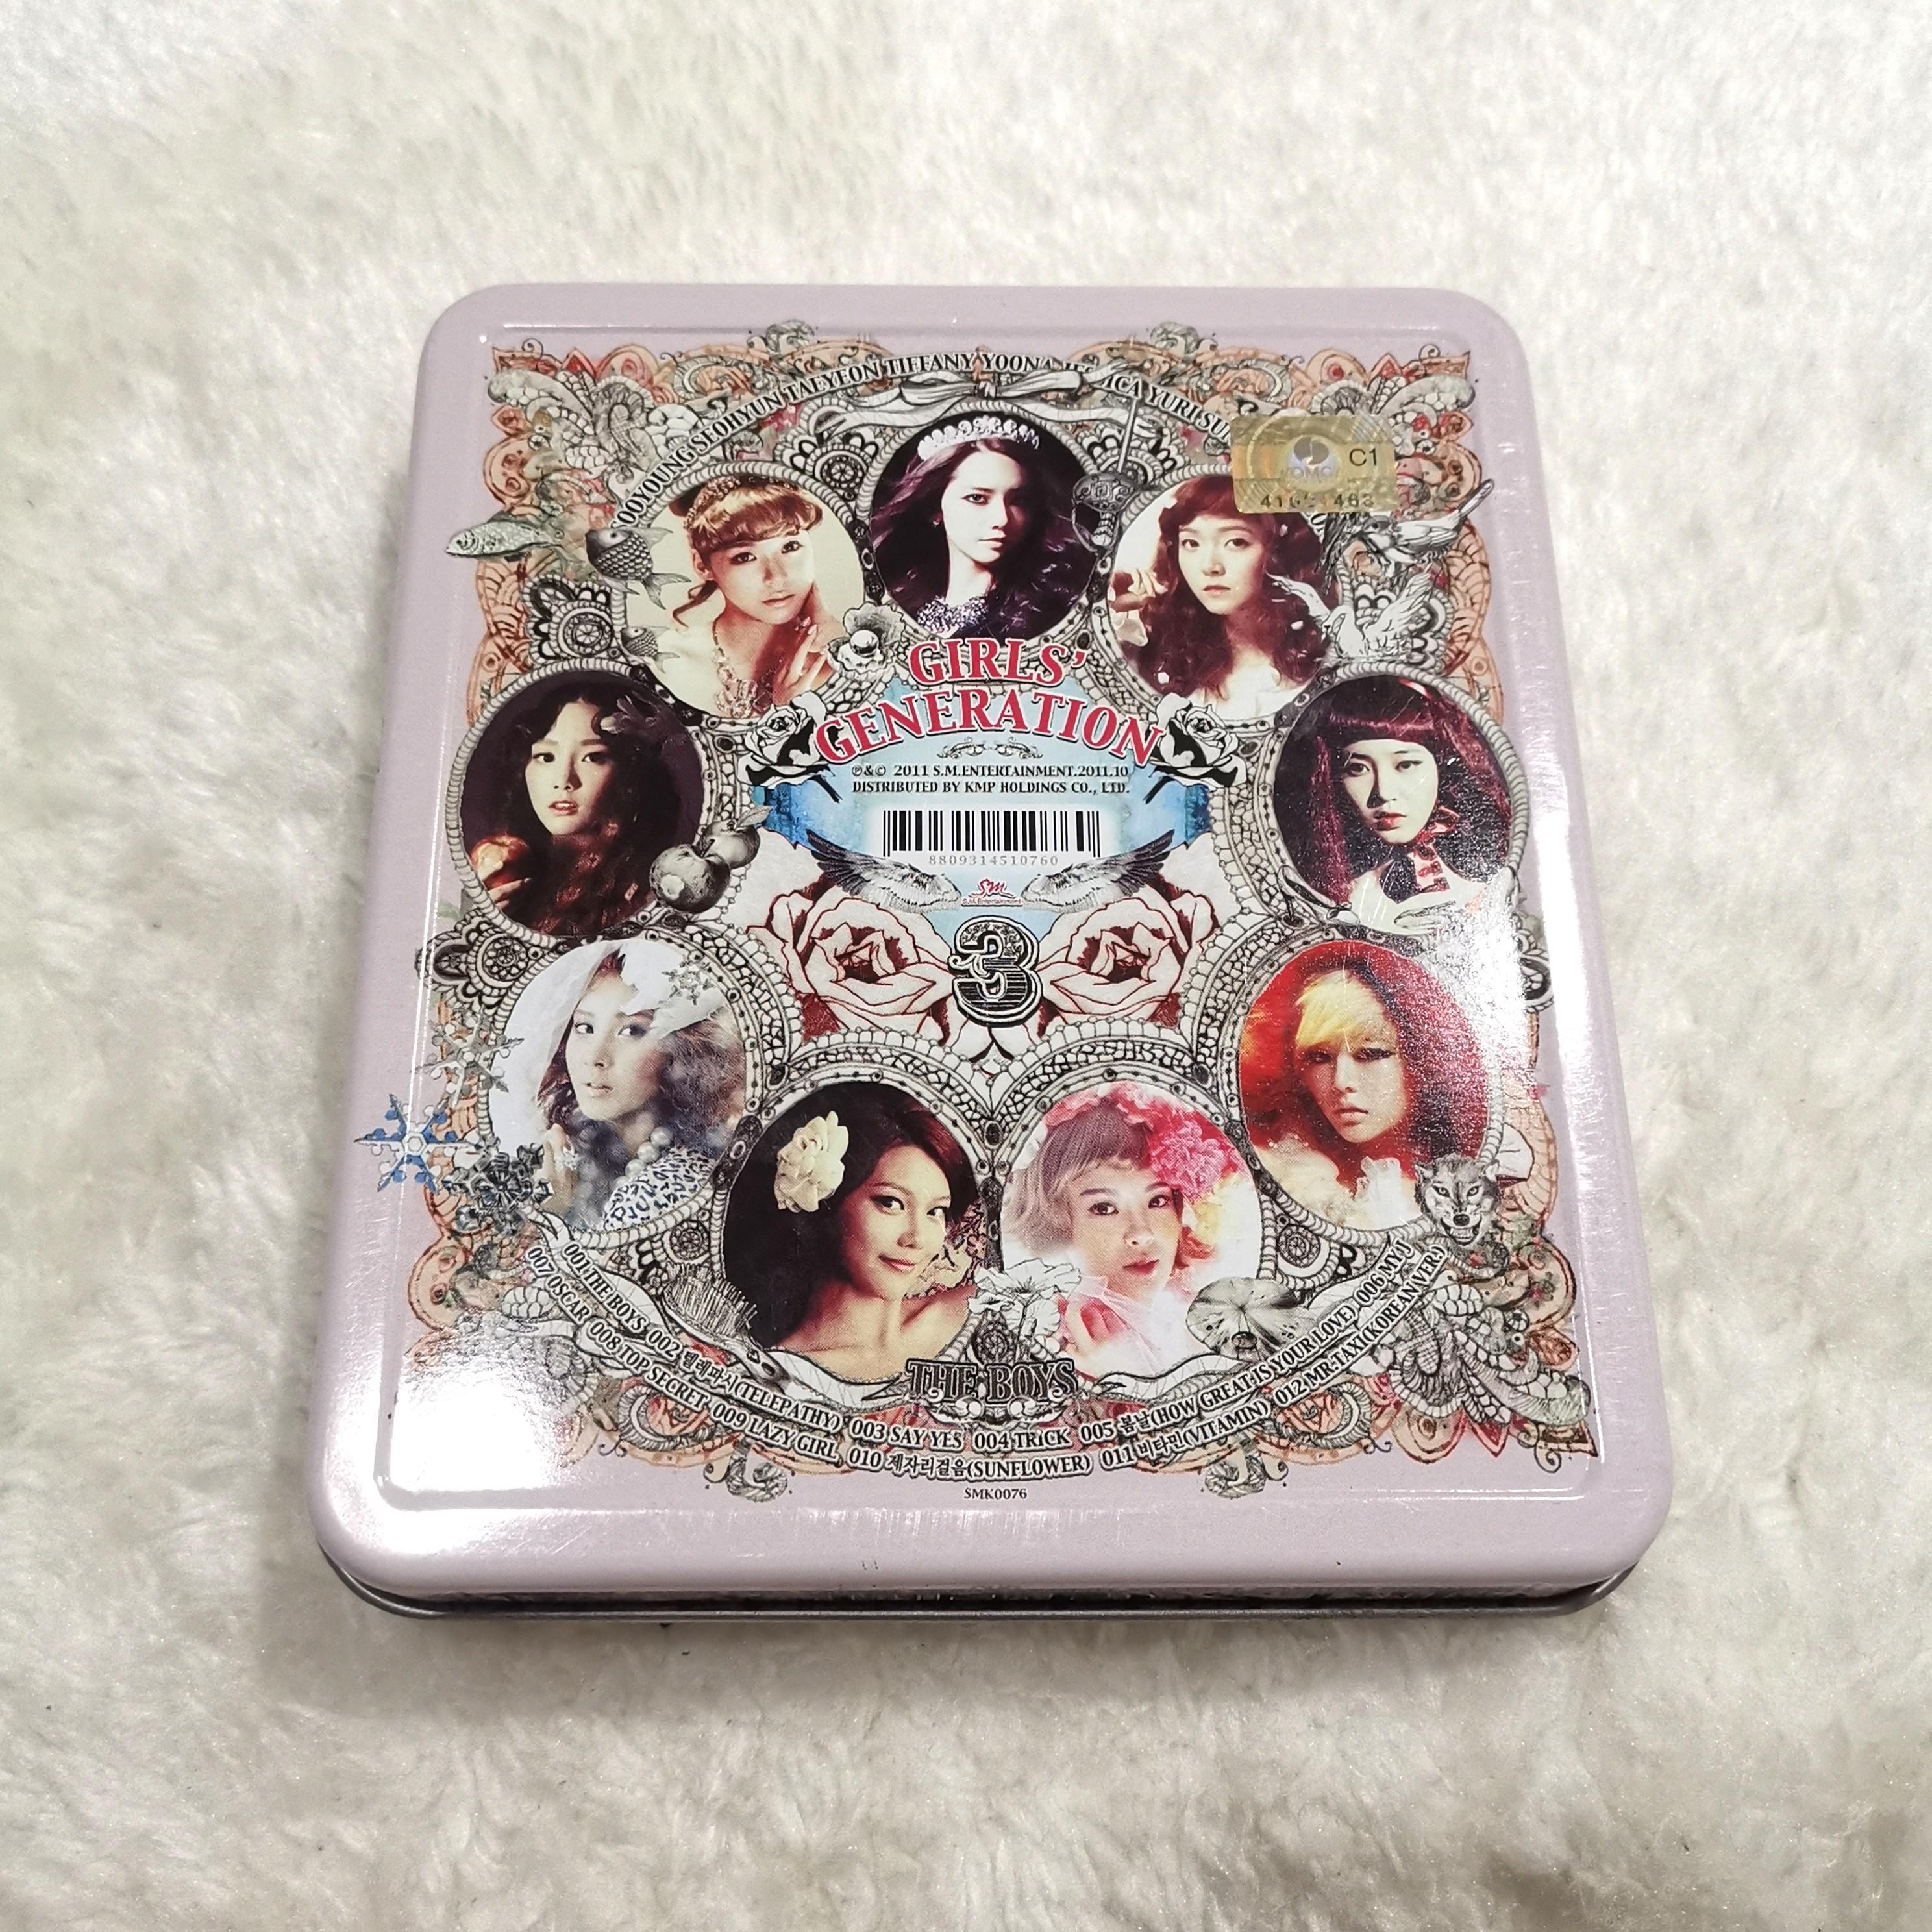 [PRICE REDUCED] SNSD ALBUM THE BOYS // GIRLS GENERATION